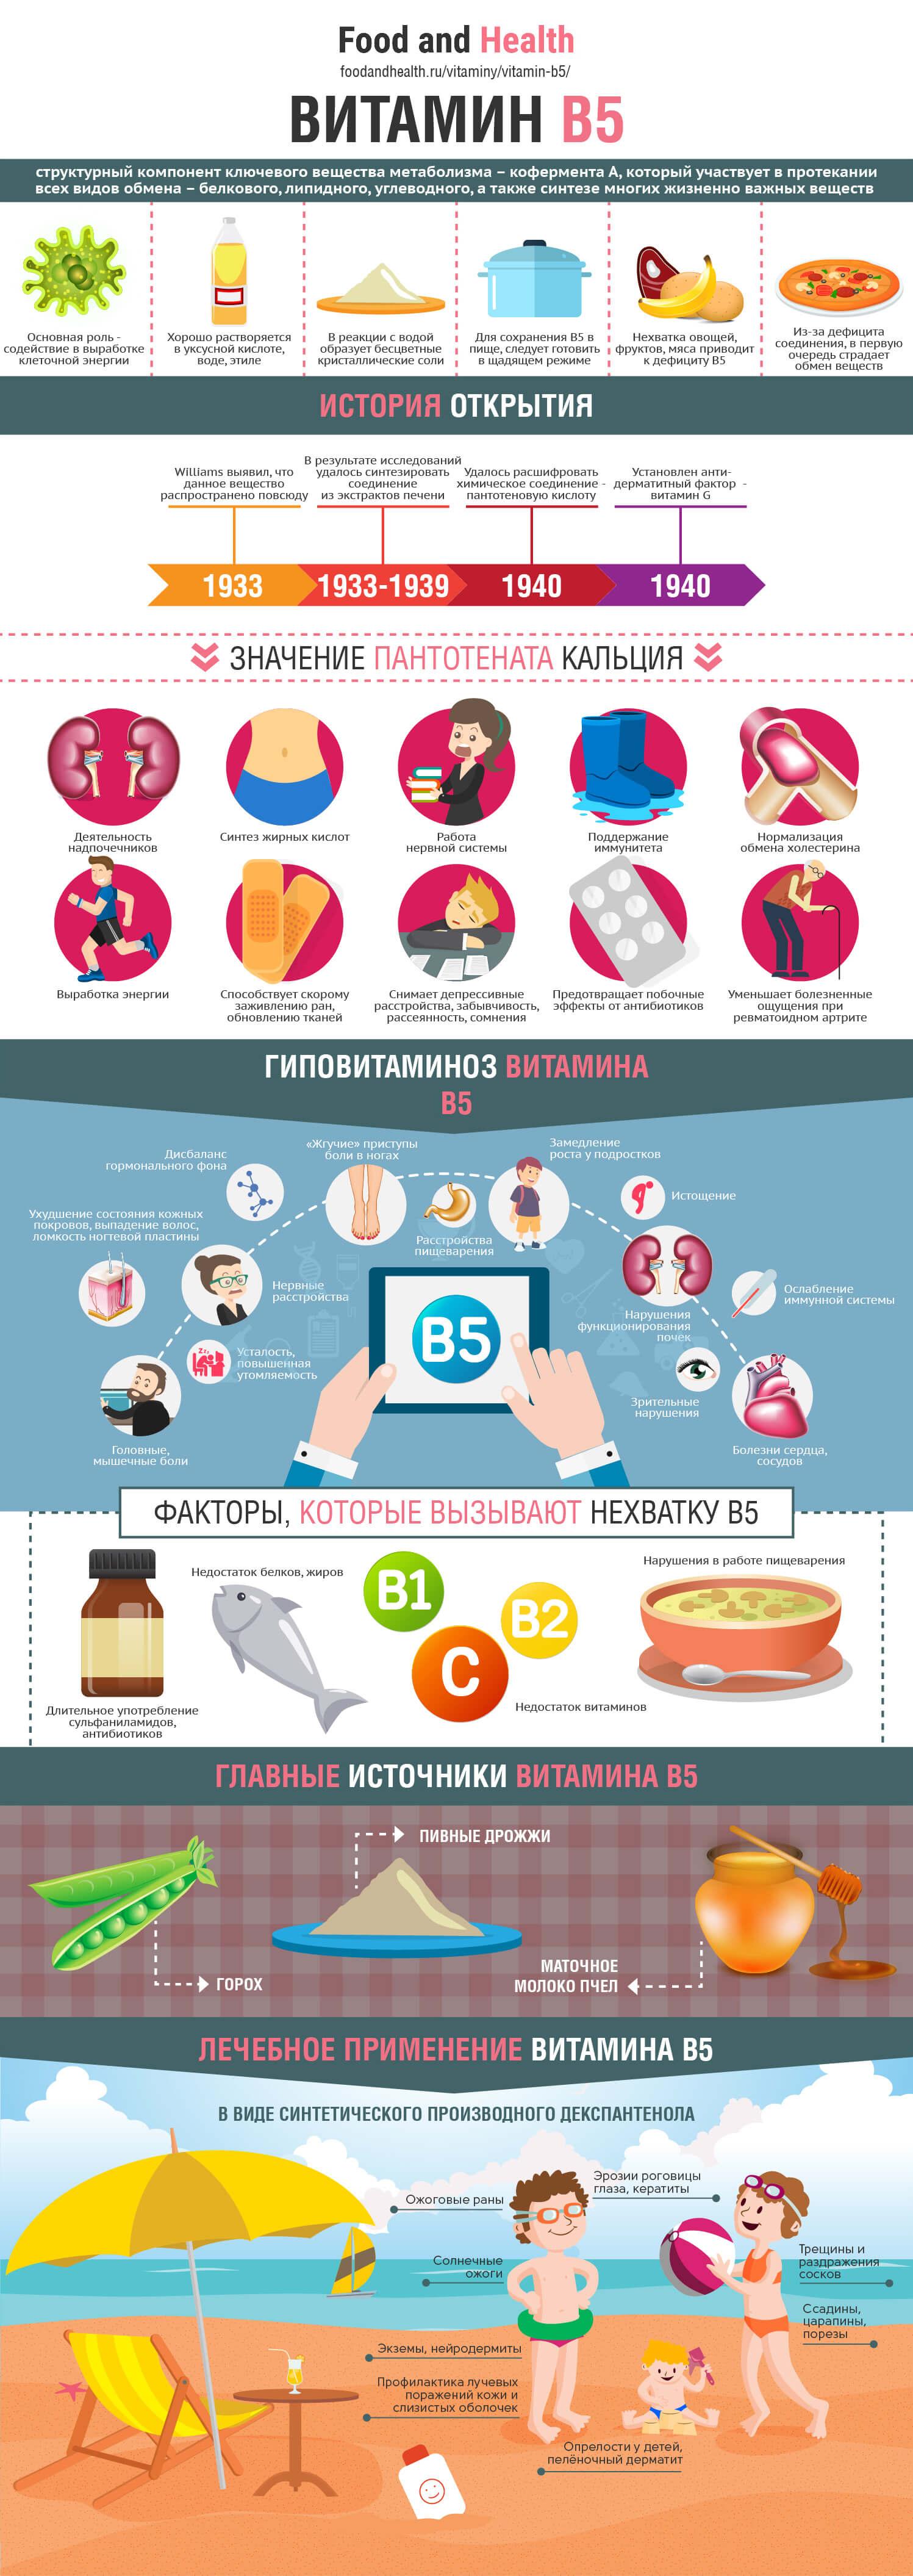 Витамин B5: инфографика